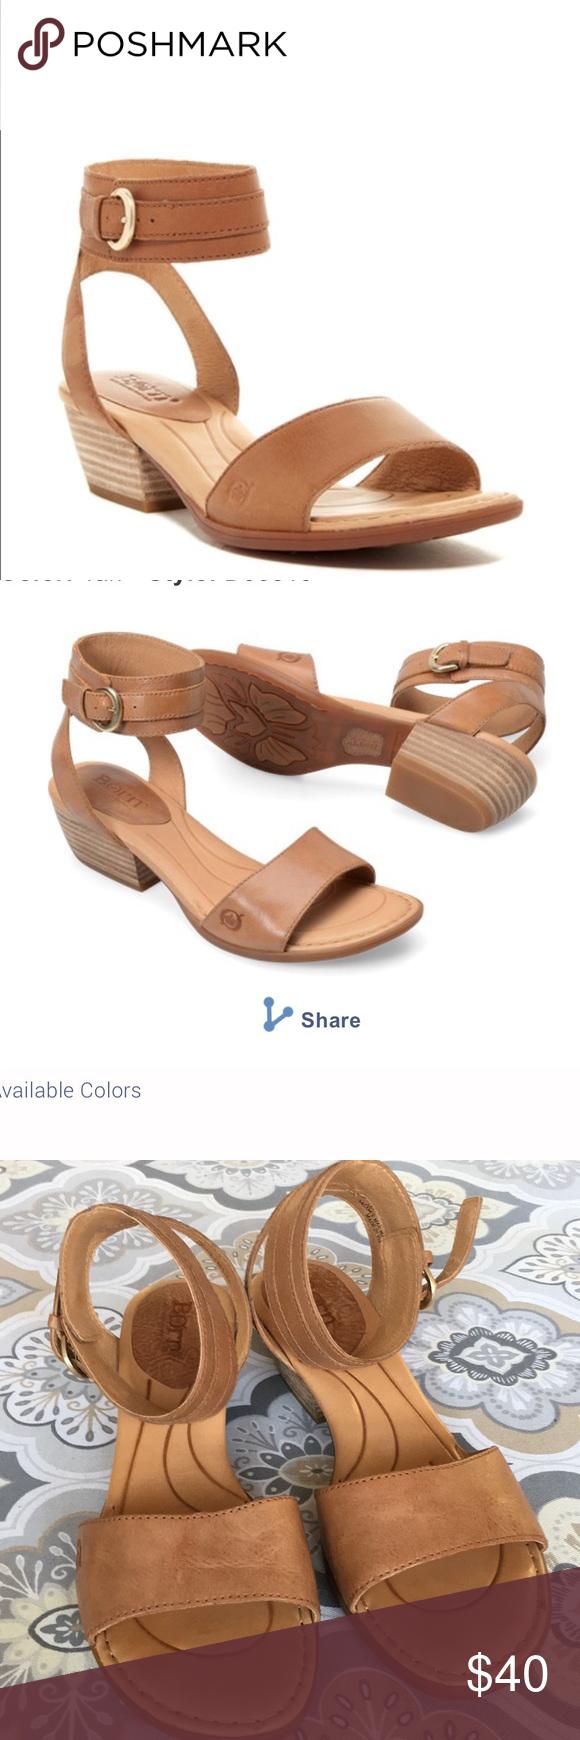 aff977e5b23 Born Beyer New 7 leather tan sandal cuff